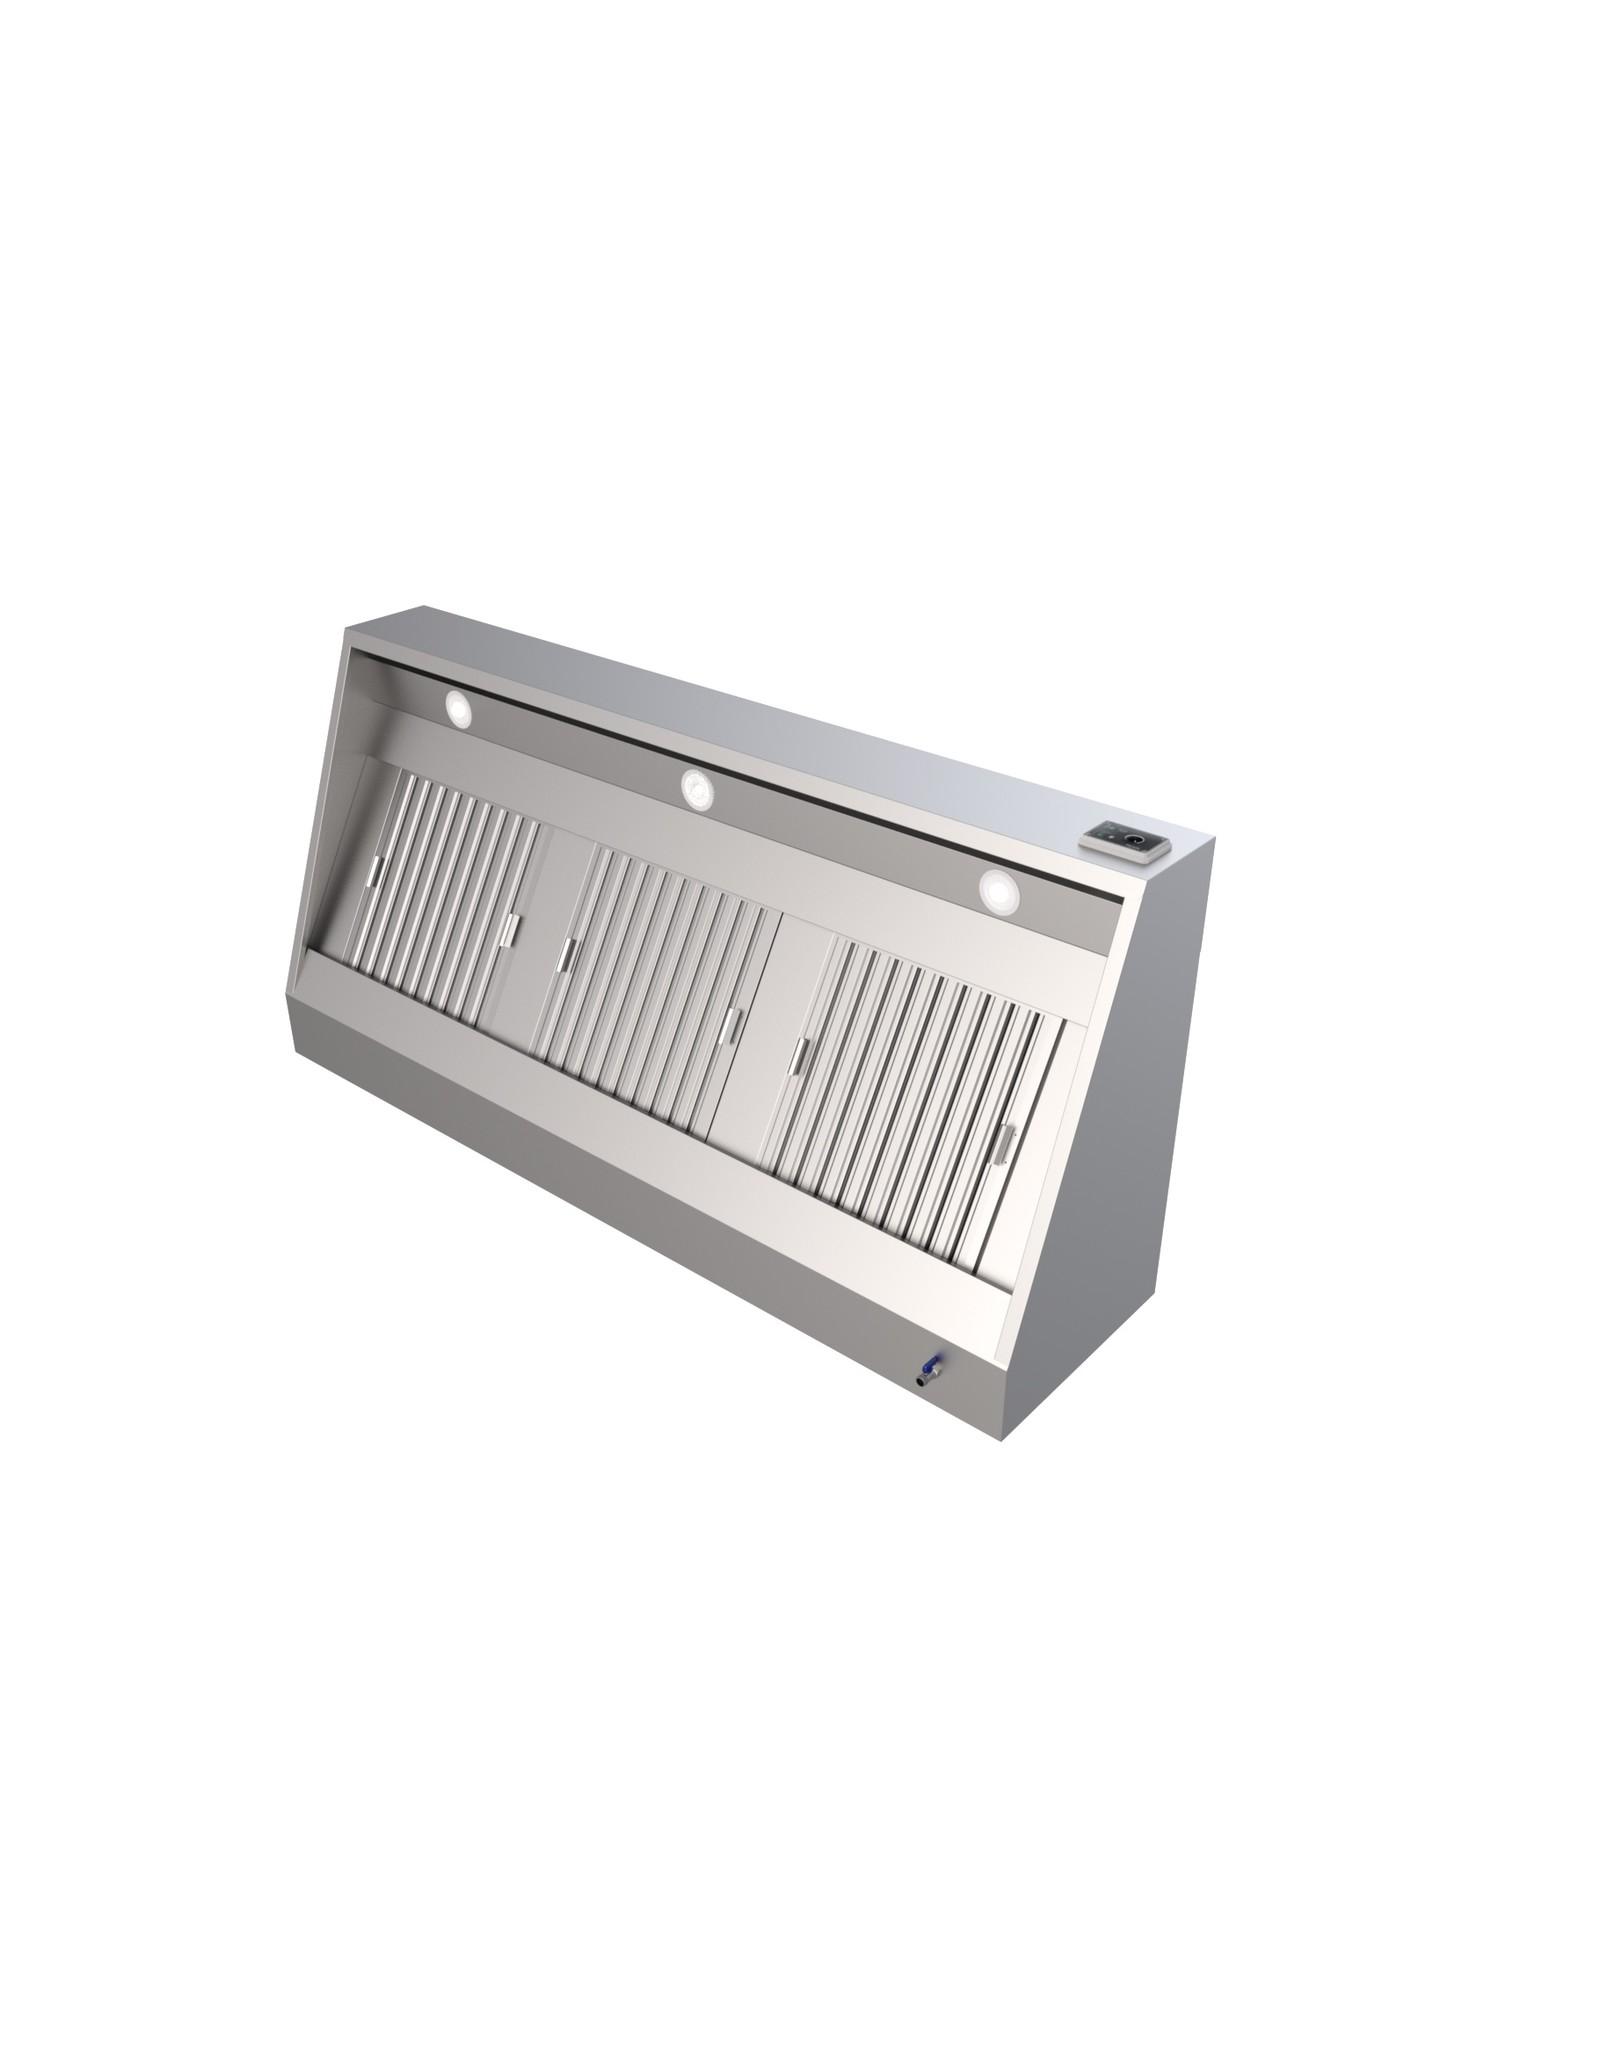 Q-Gastro Edelstahl-Dunstabzugshaube NEU !! Beleuchtung + Motor + Controller + Filter 200x70x54